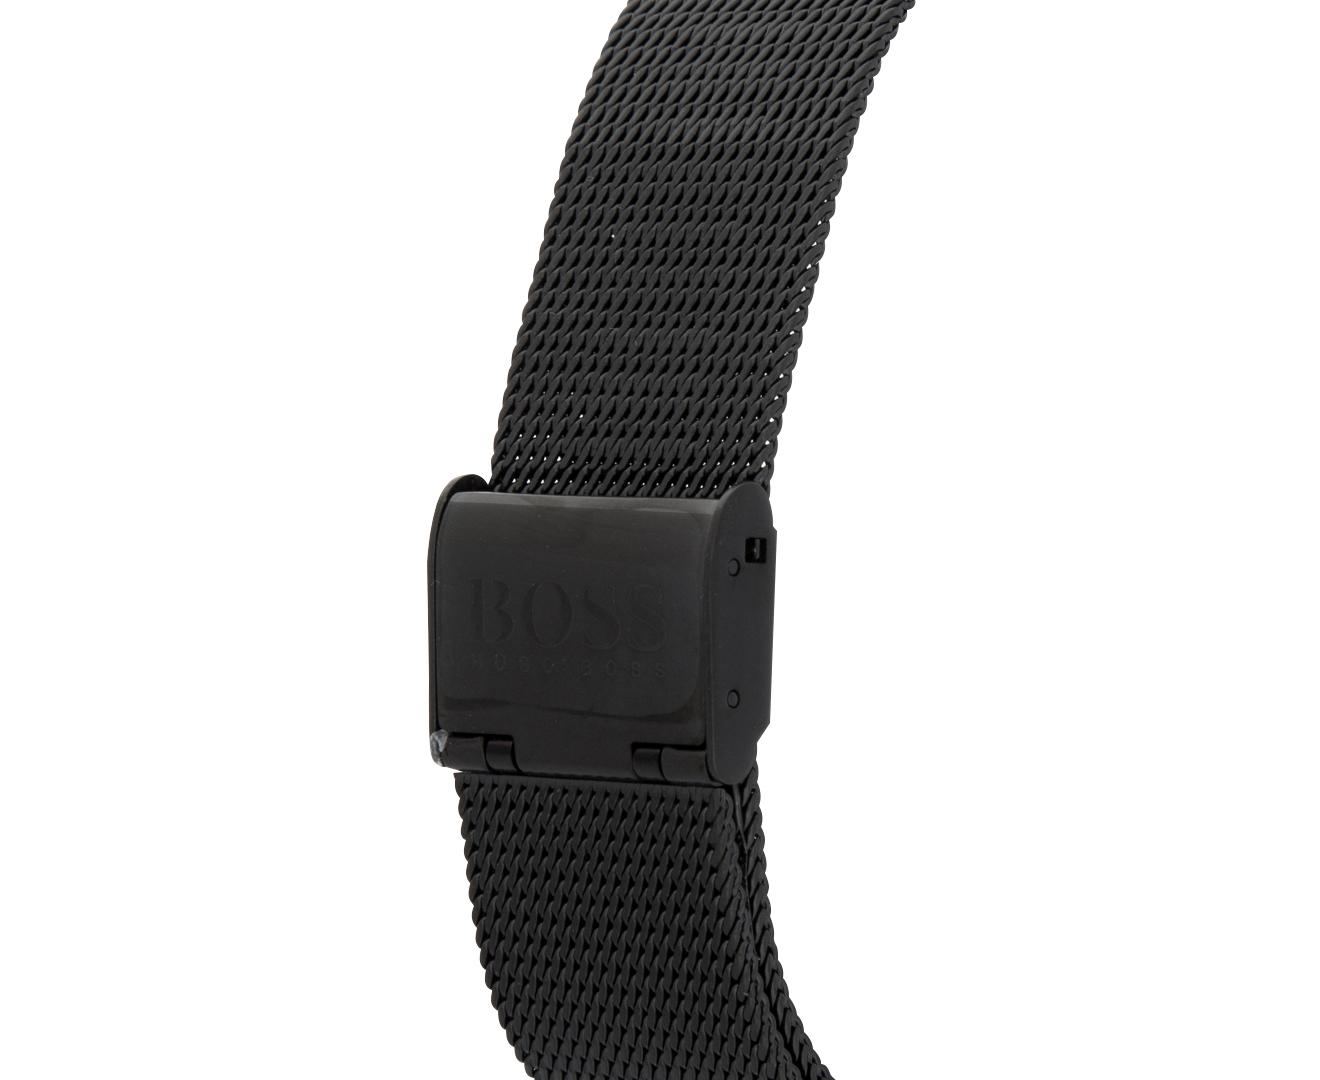 ea6b778a85e4f Hugo Boss Men s 40mm Horizon Stainless Steel Watch - Black Black ...